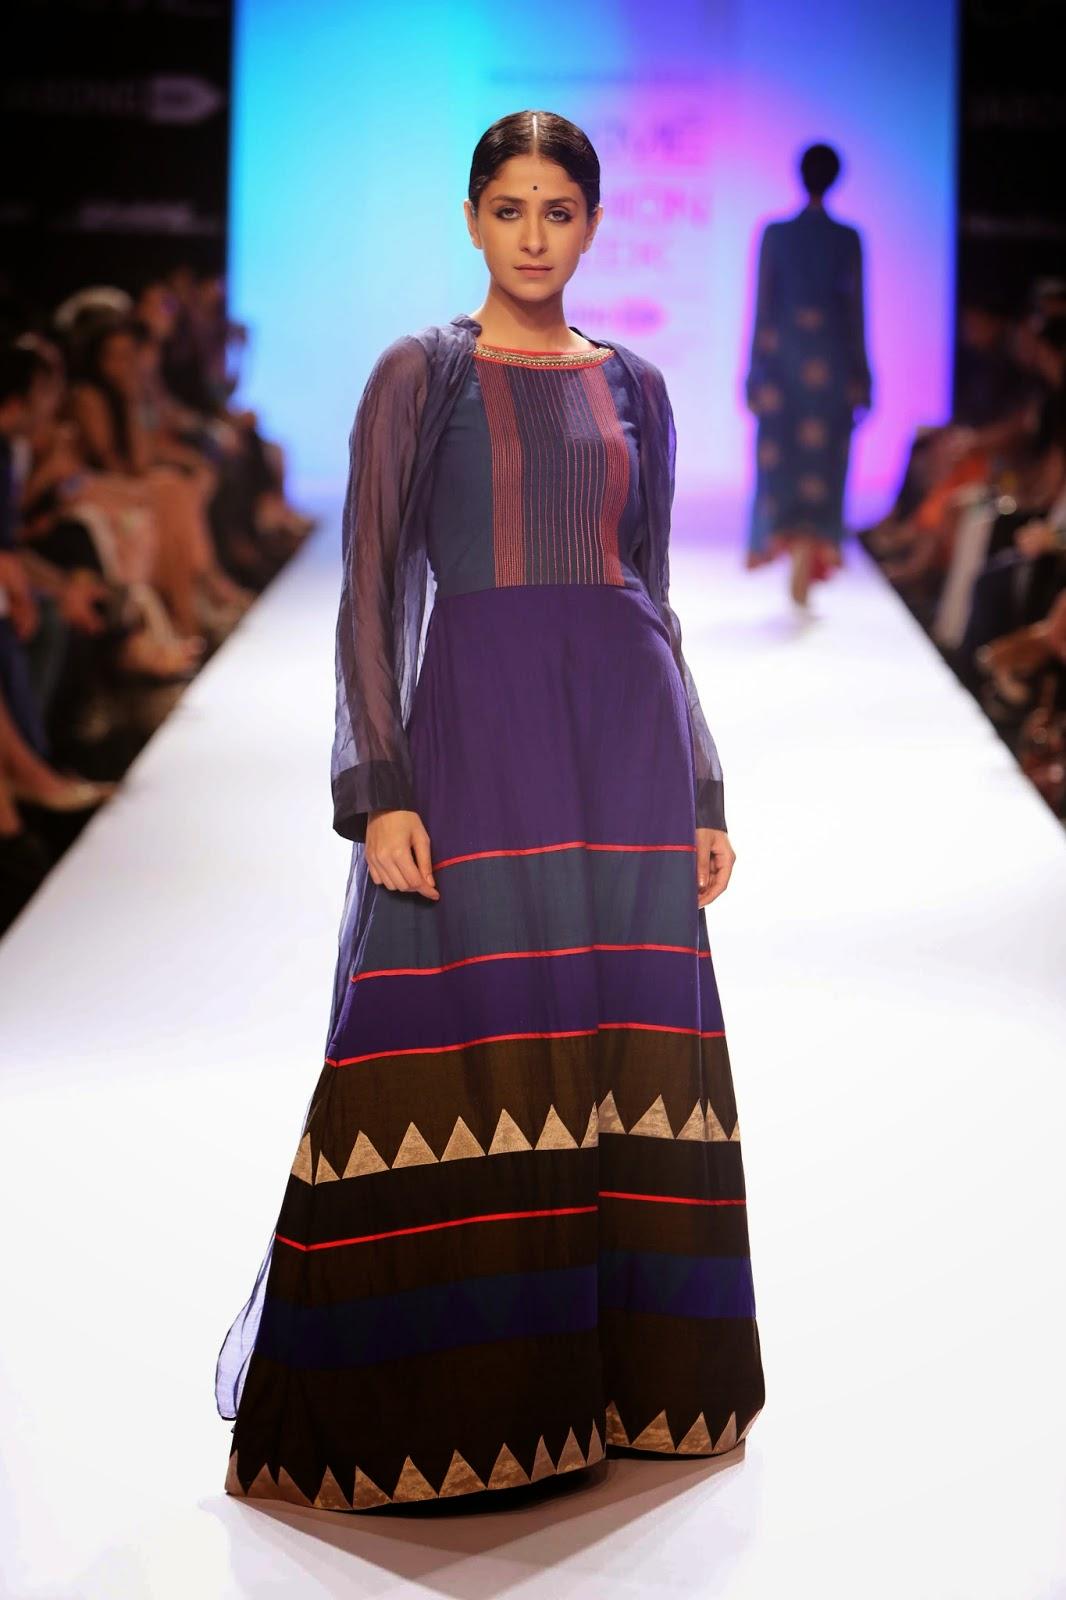 http://aquaintperspective.blogspot.in/, Priyadarshini Rao